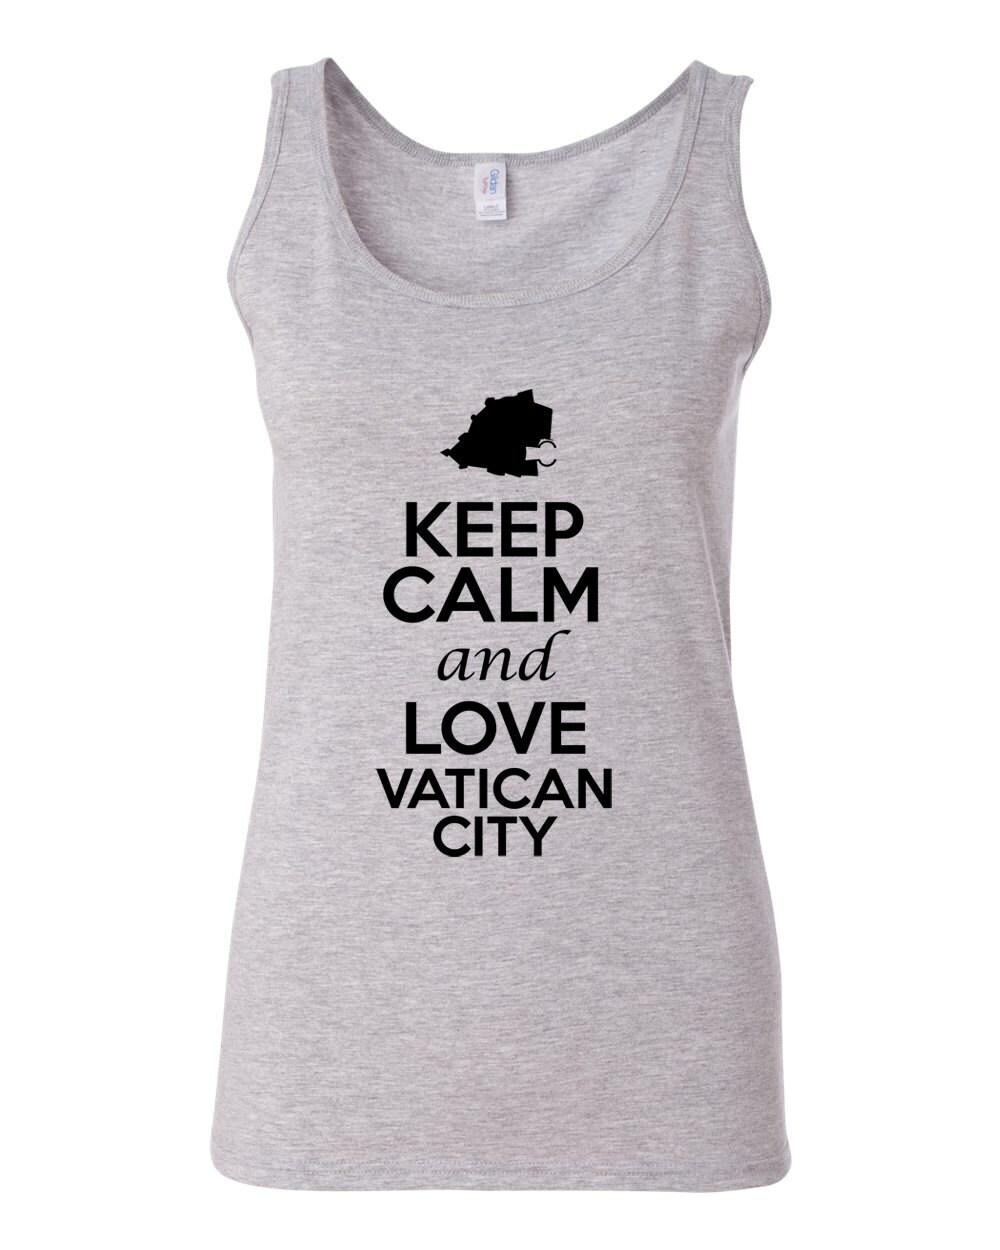 City Shirts Junior Keep Calm And Love Vatican City Novelty Statement Sleeveless Tank Top 1054 at Sears.com